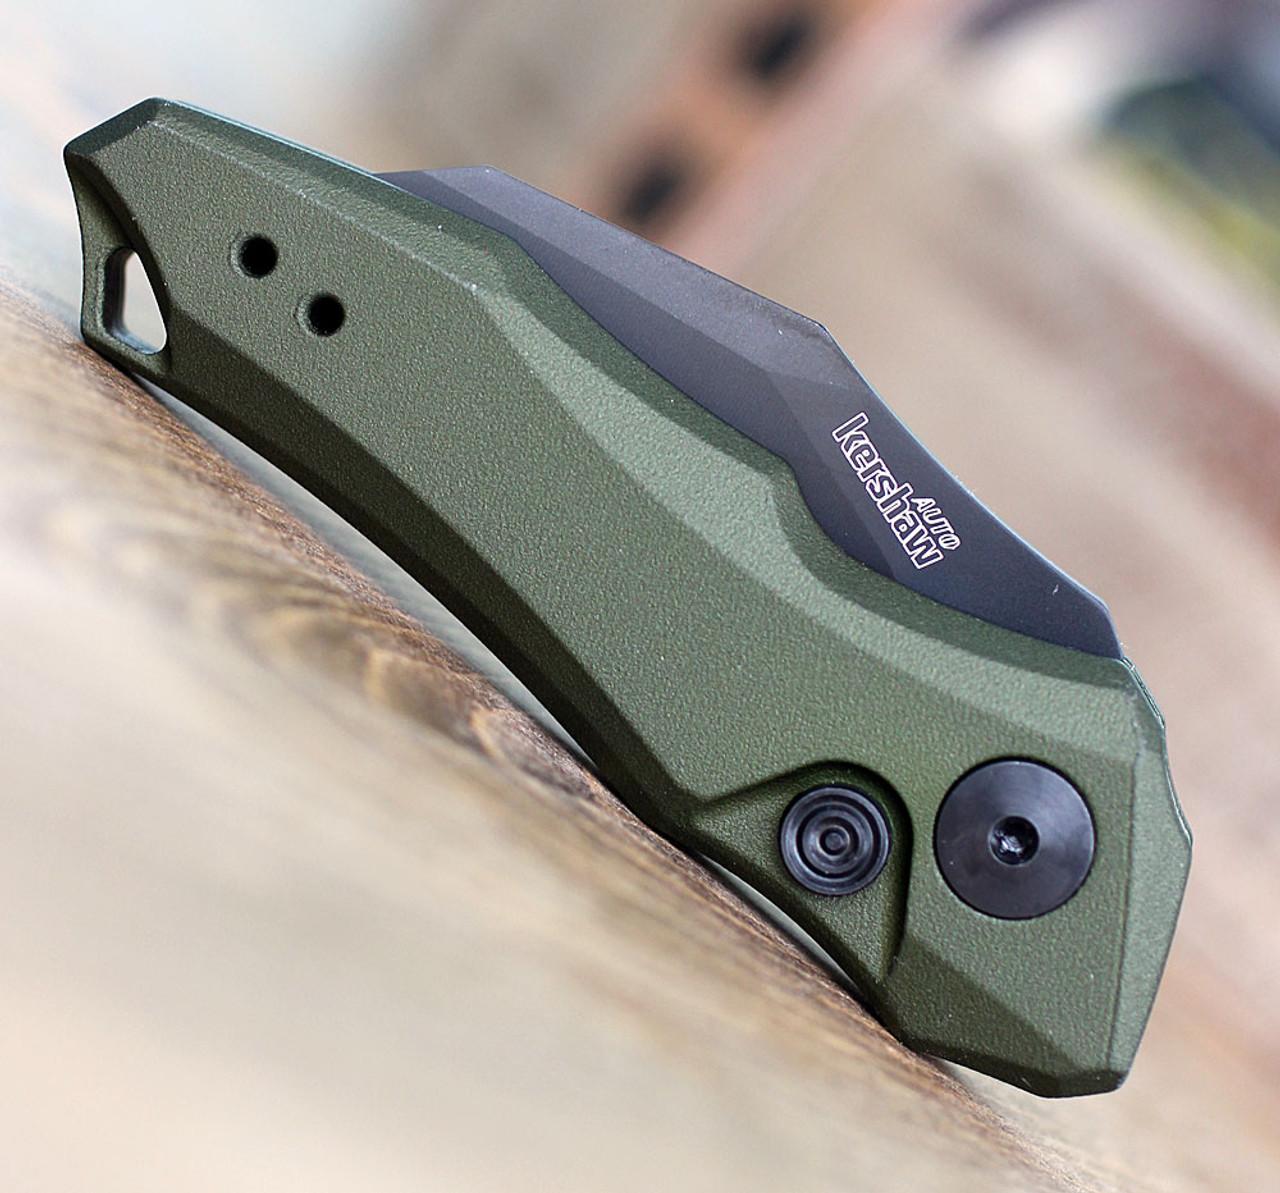 "Kershaw 7350OLBLK Launch 10, 1.9"" CPM 154 Black Plain Blade, Olive Green Aluminum Handle"